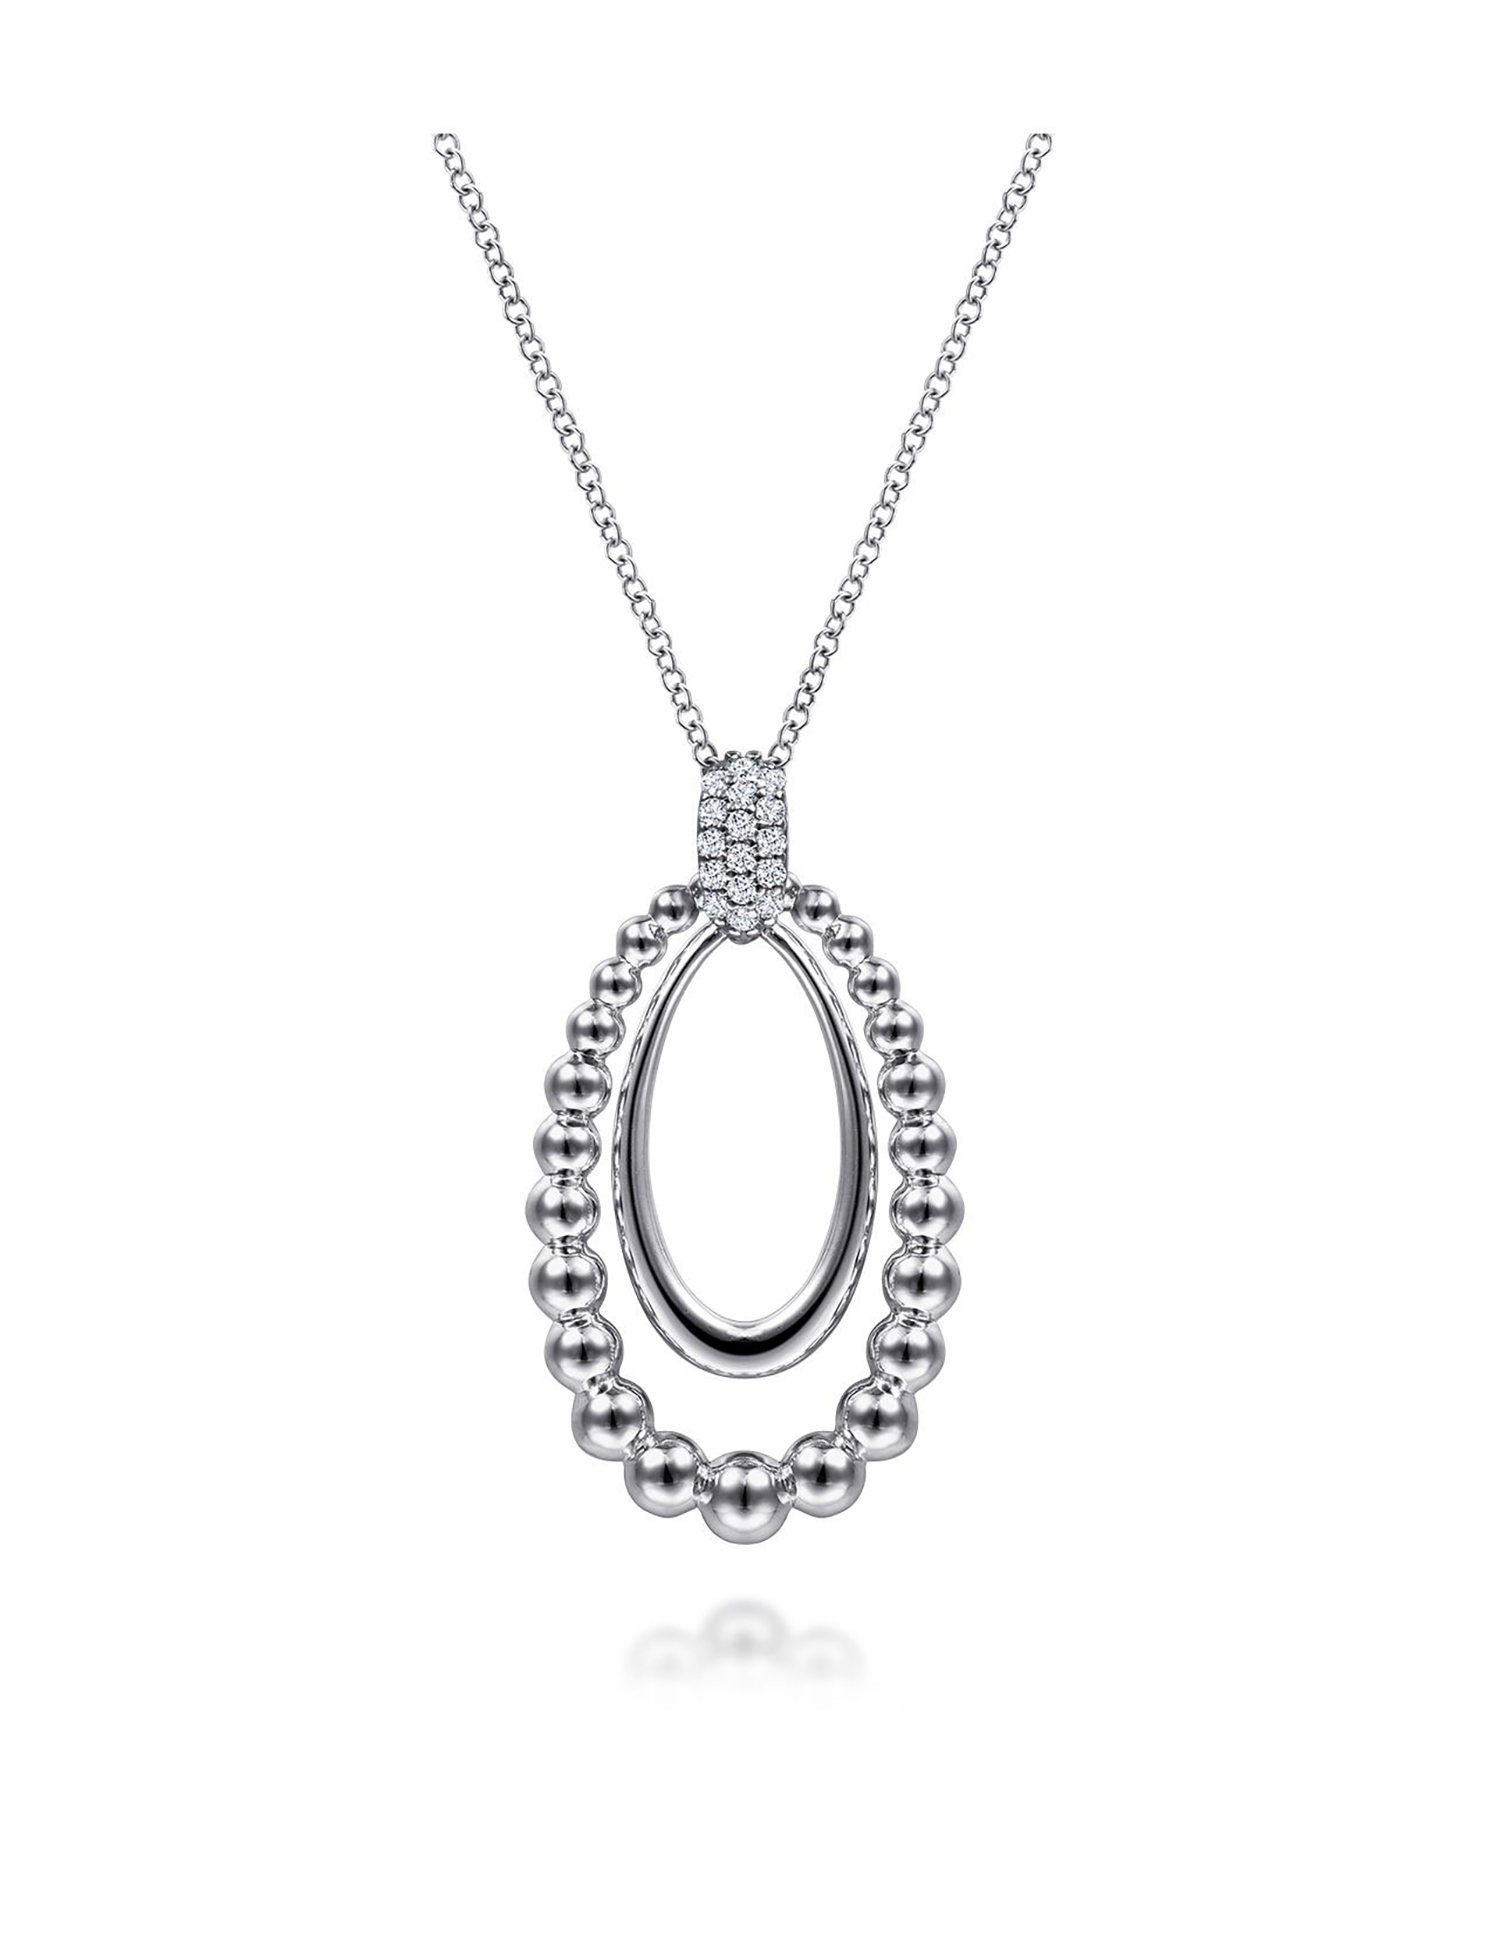 INSTORE Design Awards 2021 – Fashion/Bridge Jewelry